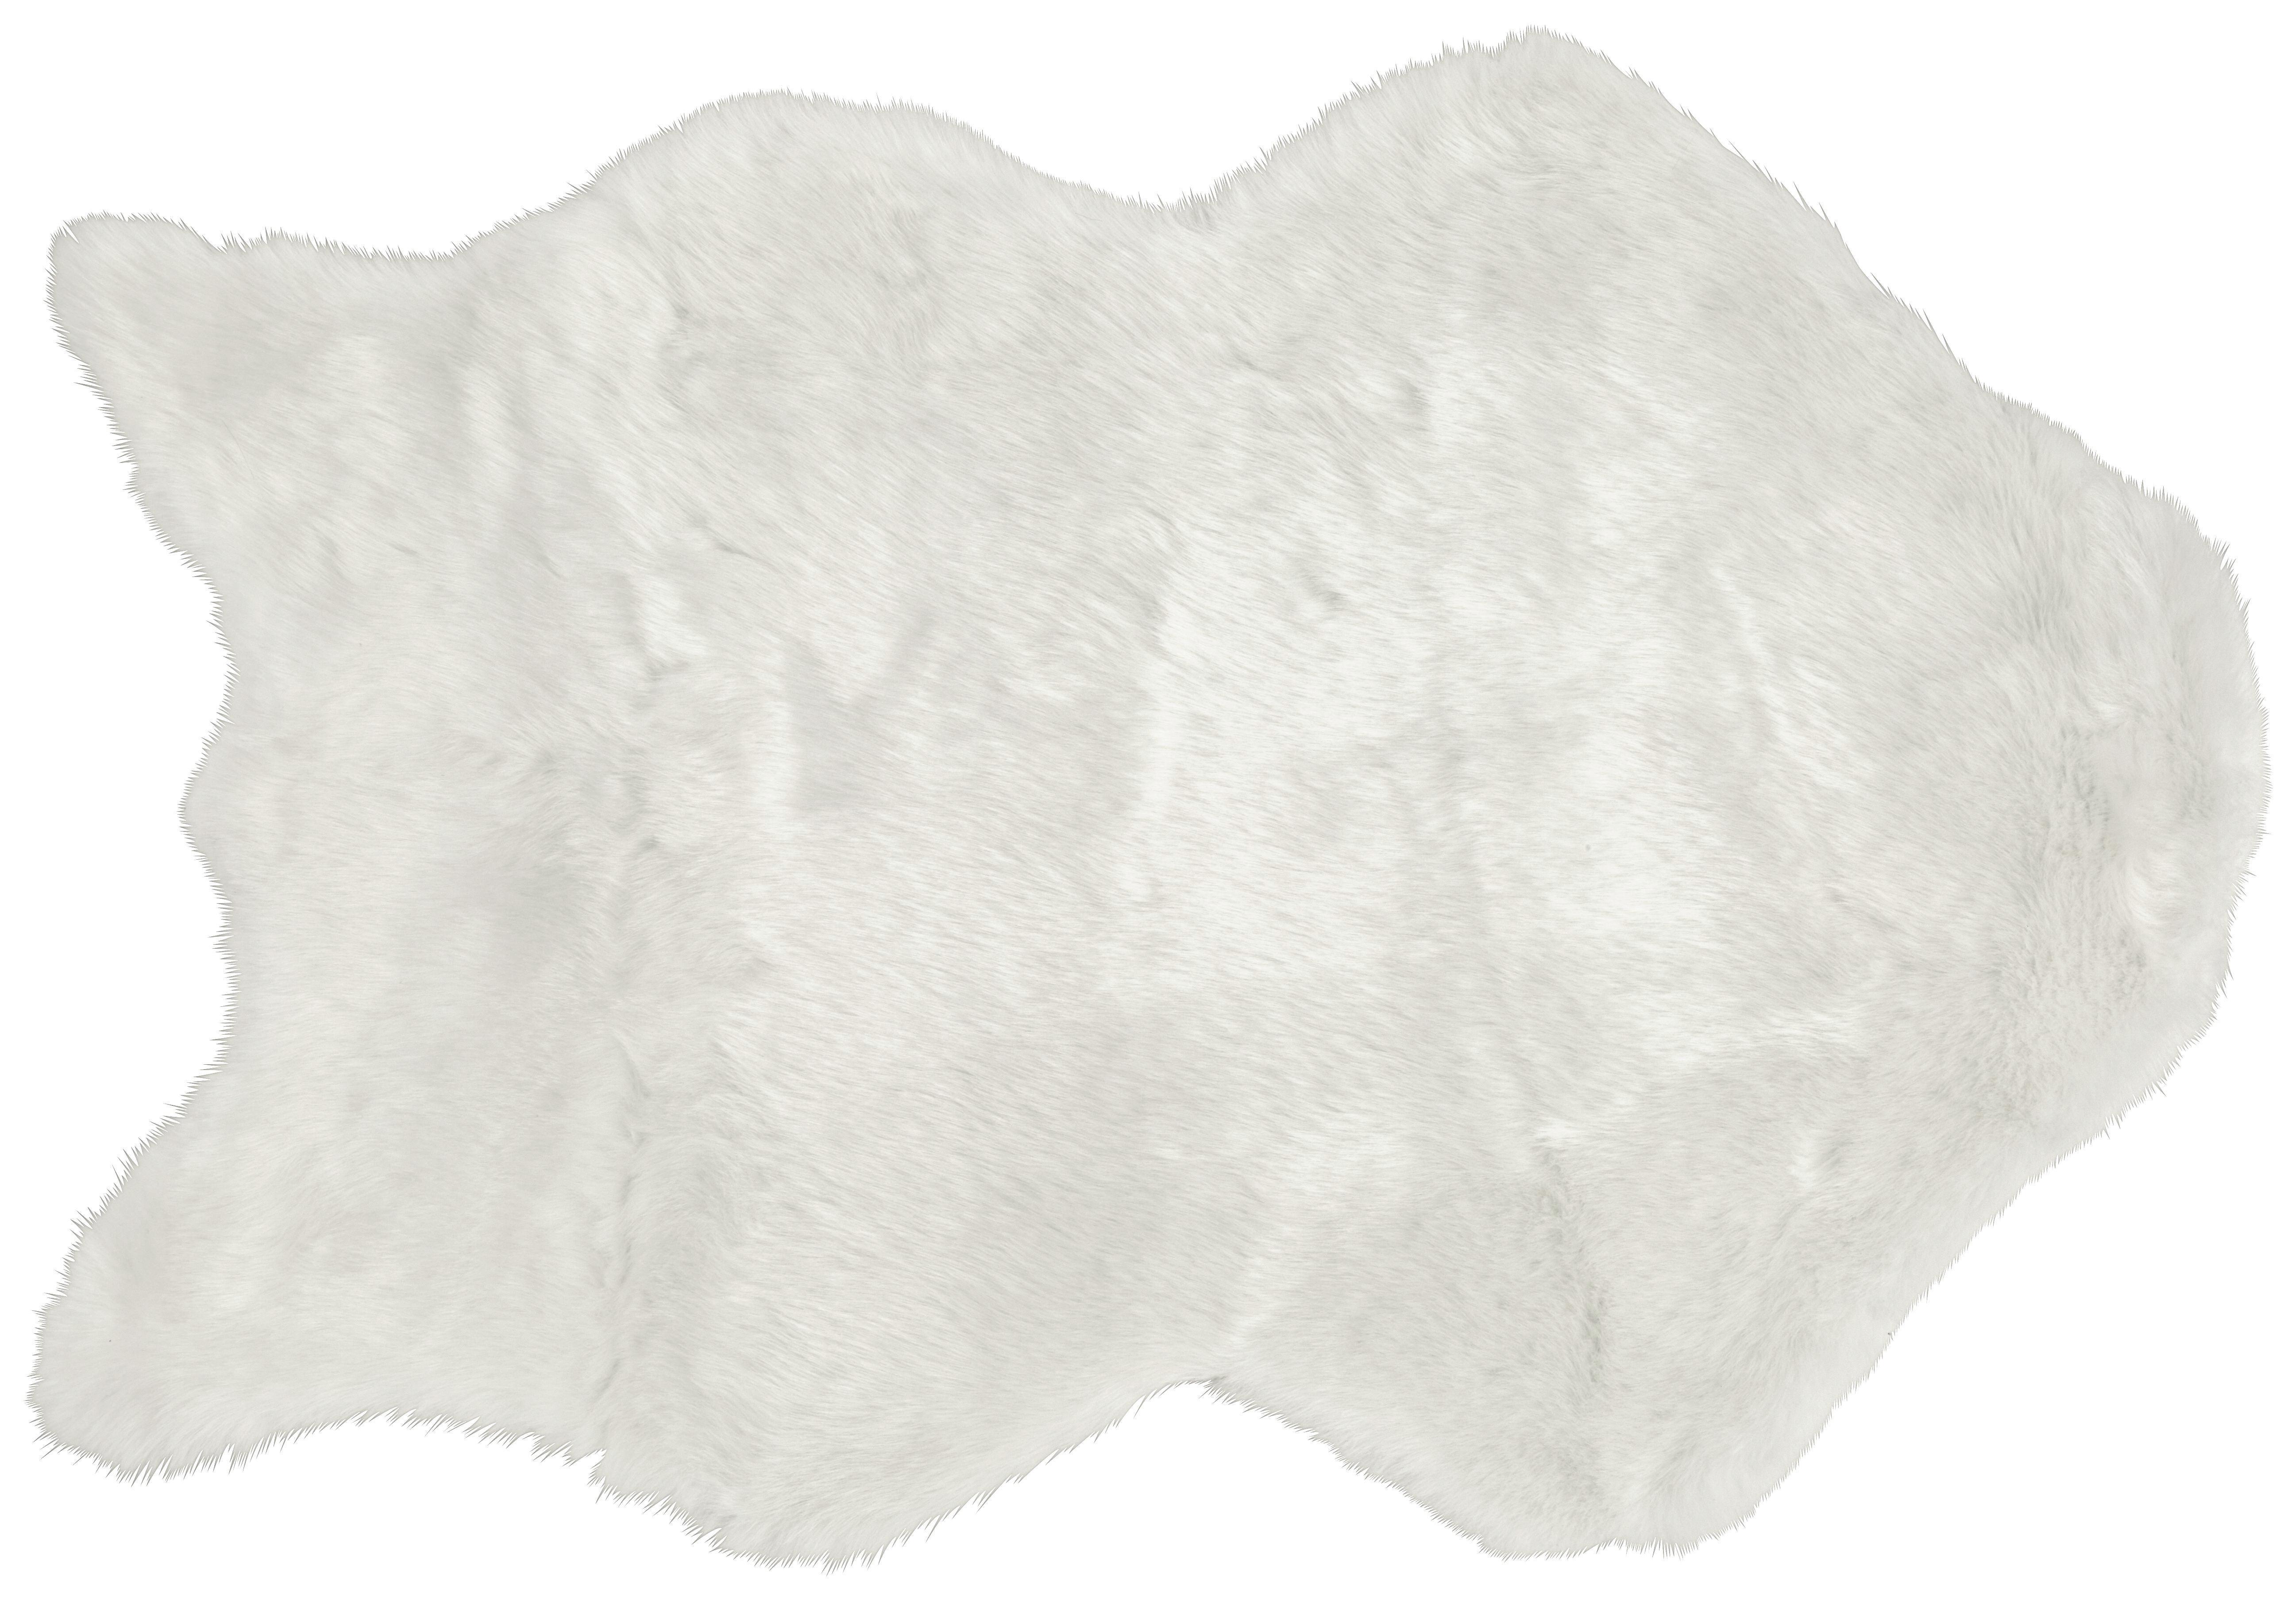 Kunstfell Lisa in Weiß, ca. 60x90cm - Weiß, Textil (60/90cm) - MÖMAX modern living